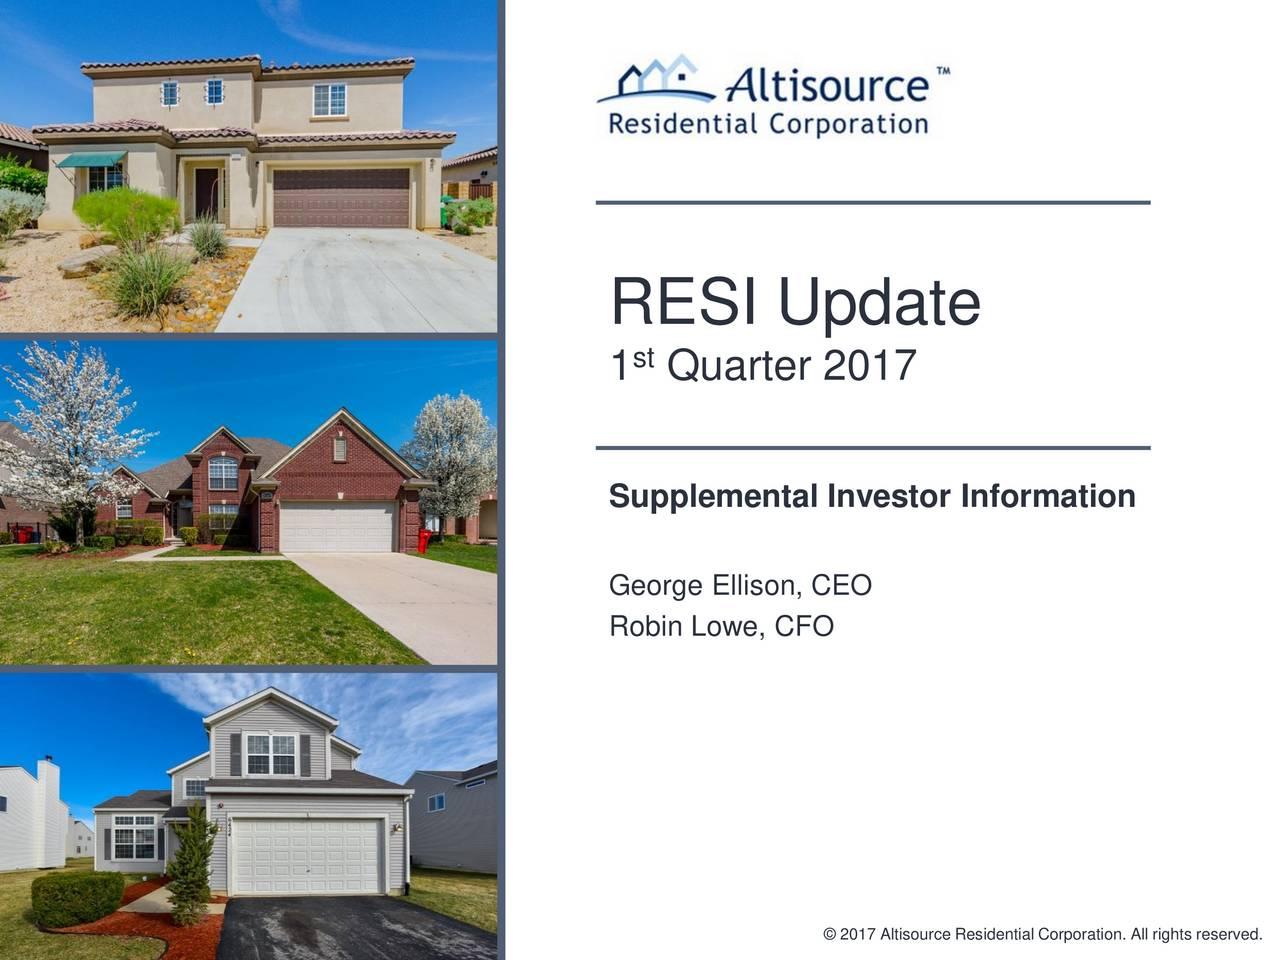 1 Quarter 2017 Supplemental Investor Information George Ellison, CEO Robin Lowe, CFO 2017 Altisource Residential Corporation. All rights reserved.